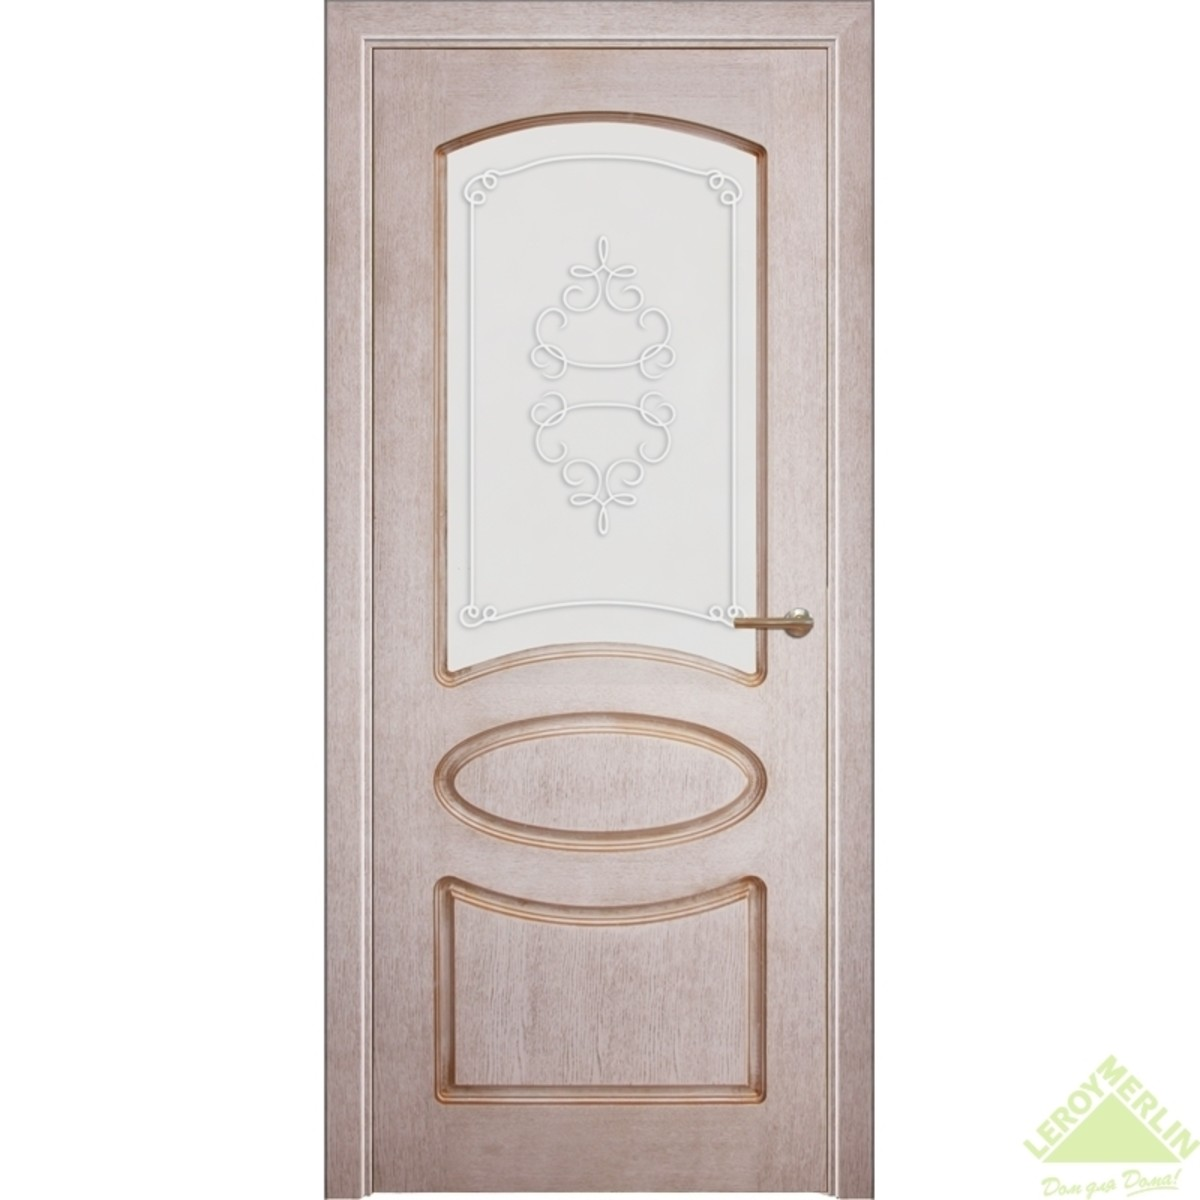 Дверь межкомнатная остеклённая 701 700x2000 мм шпон дуб патина